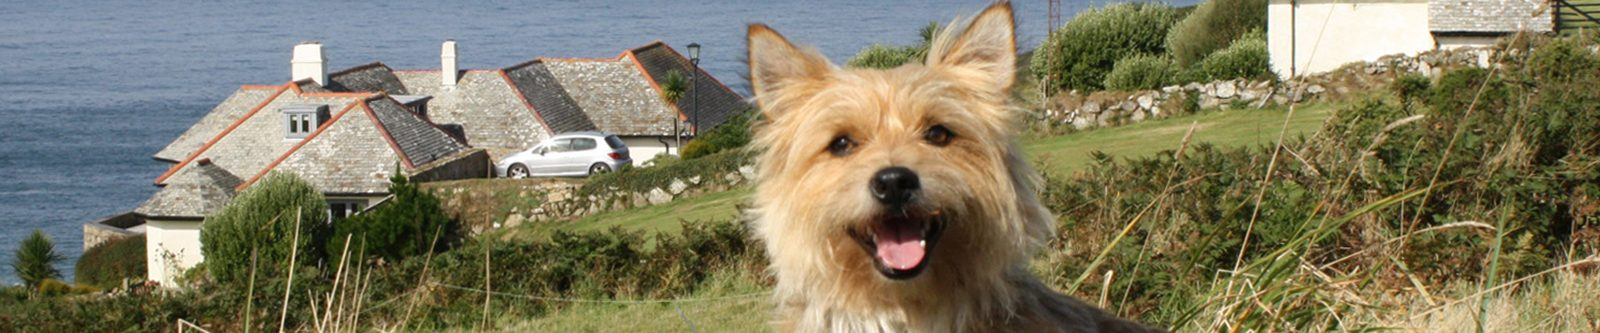 little terrier dog in grass